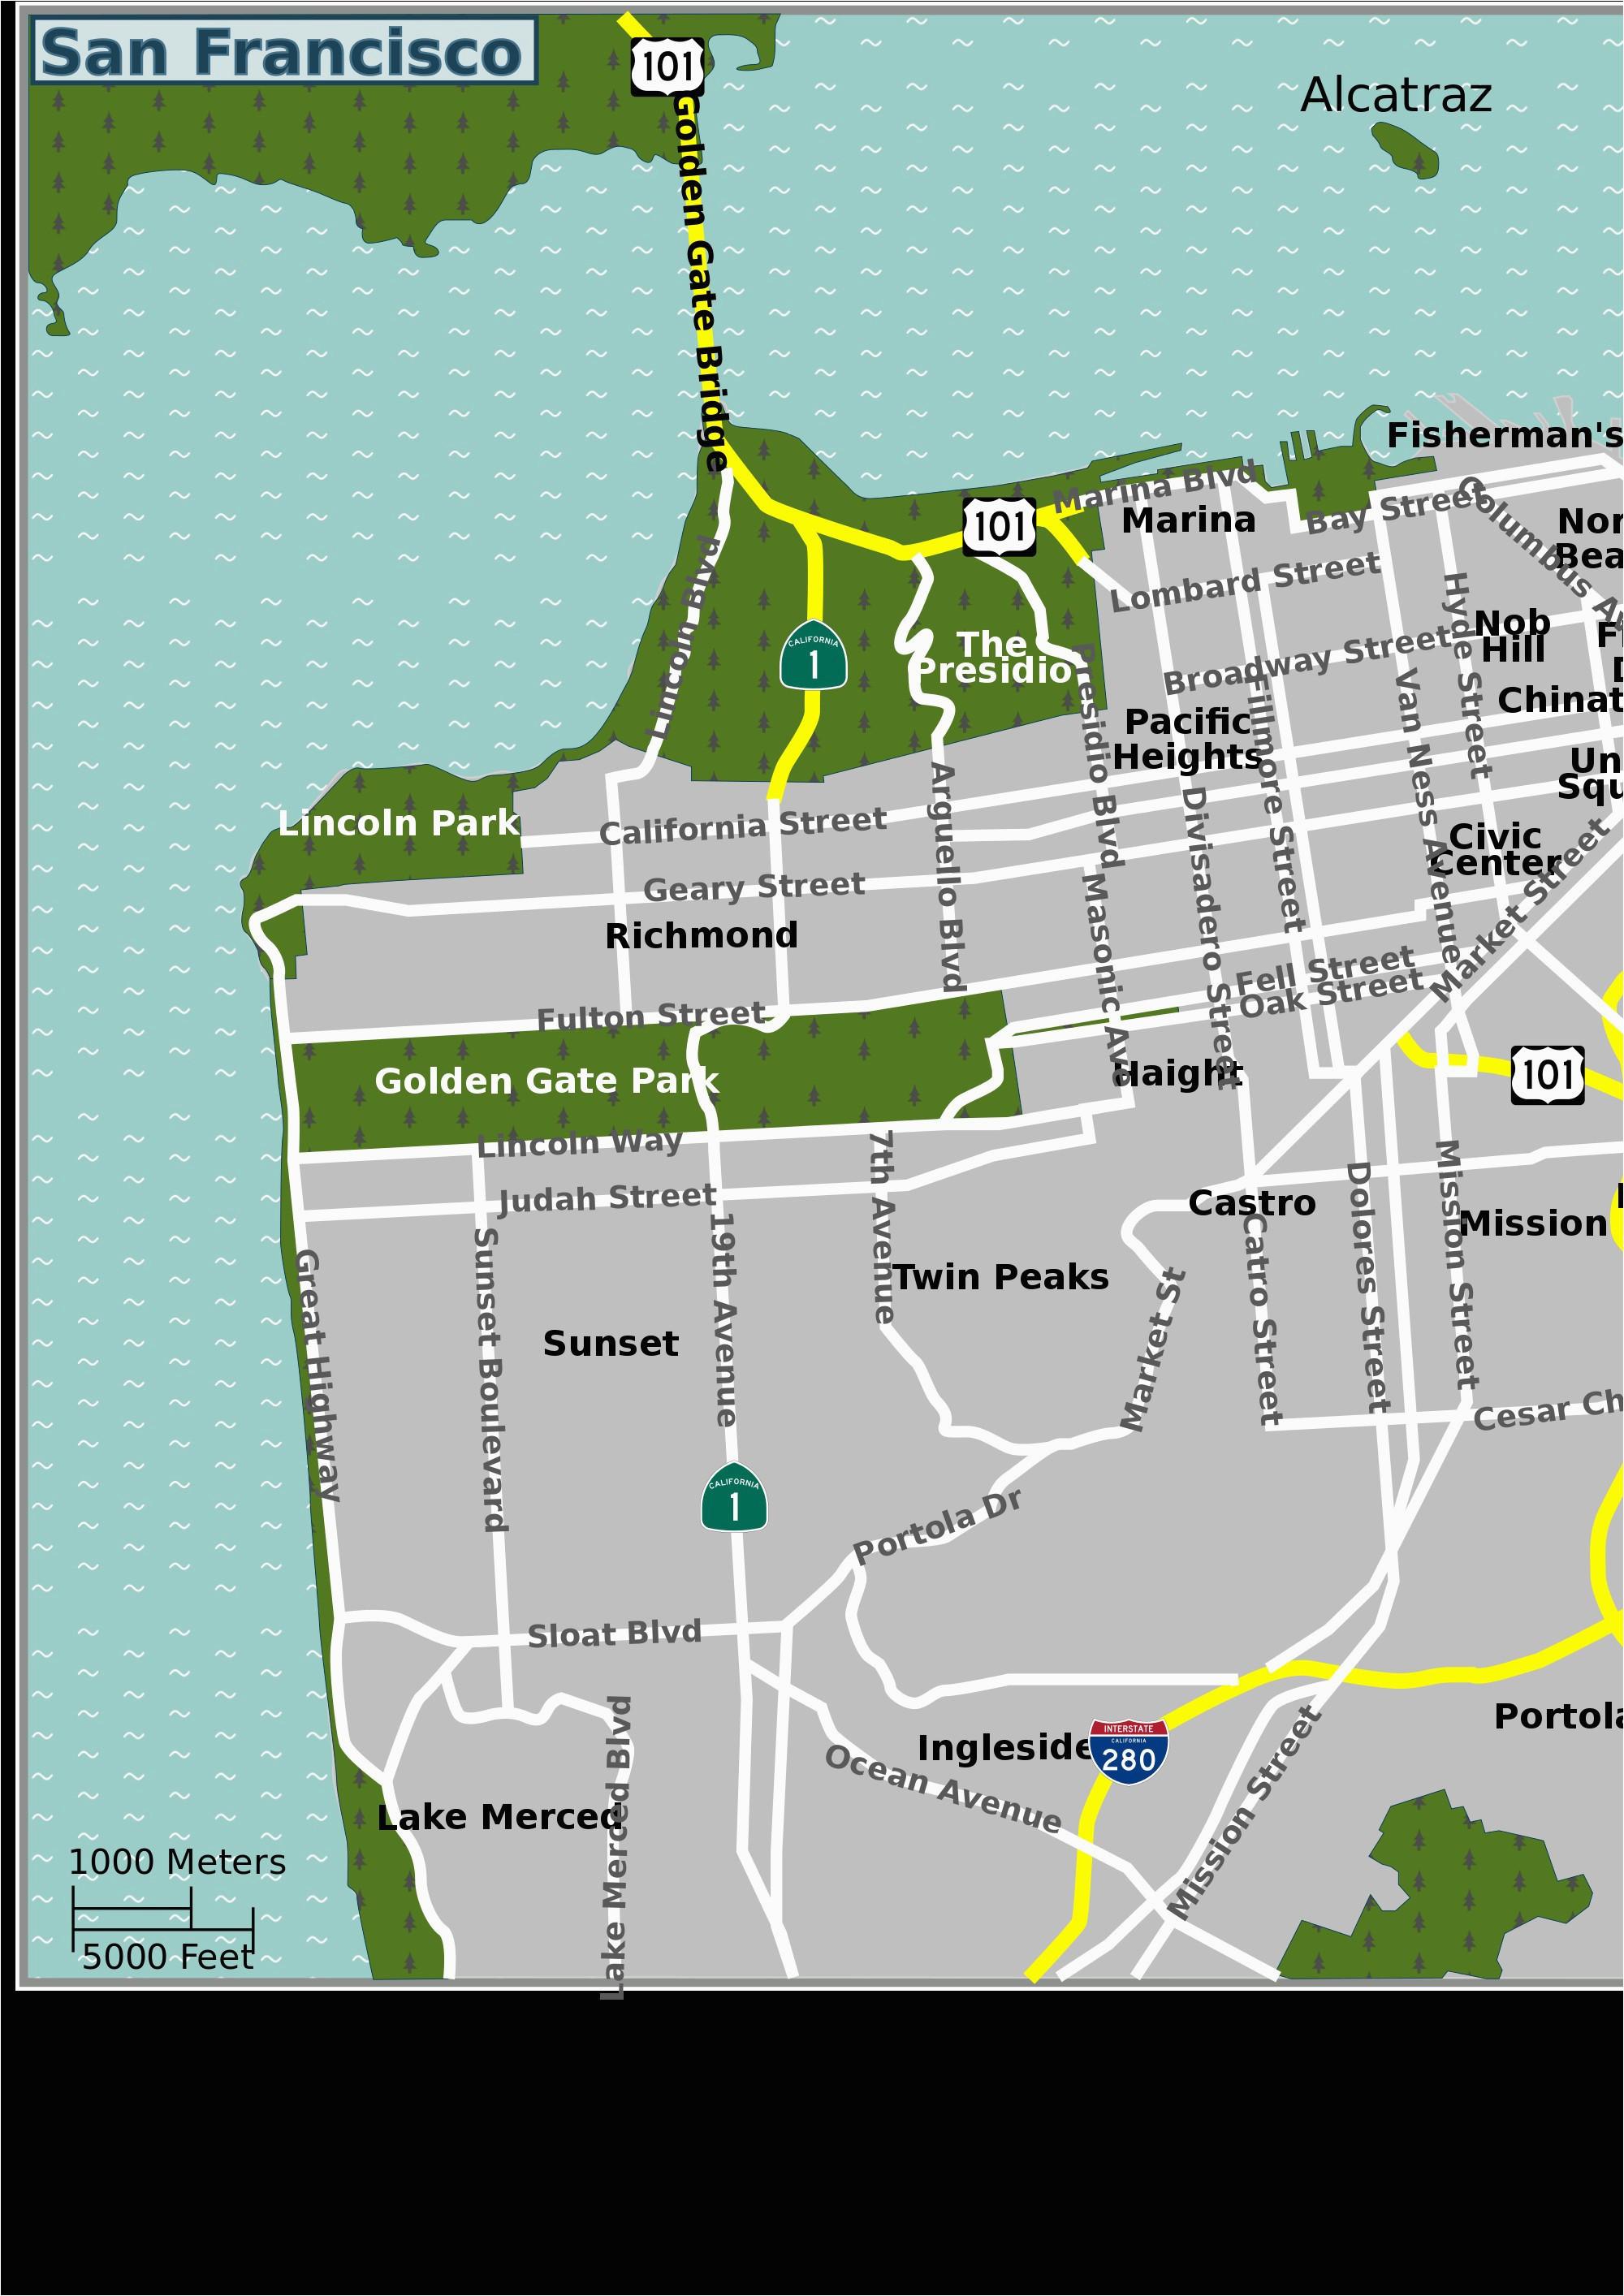 San Francisco On A Map Of California | secretmuseum